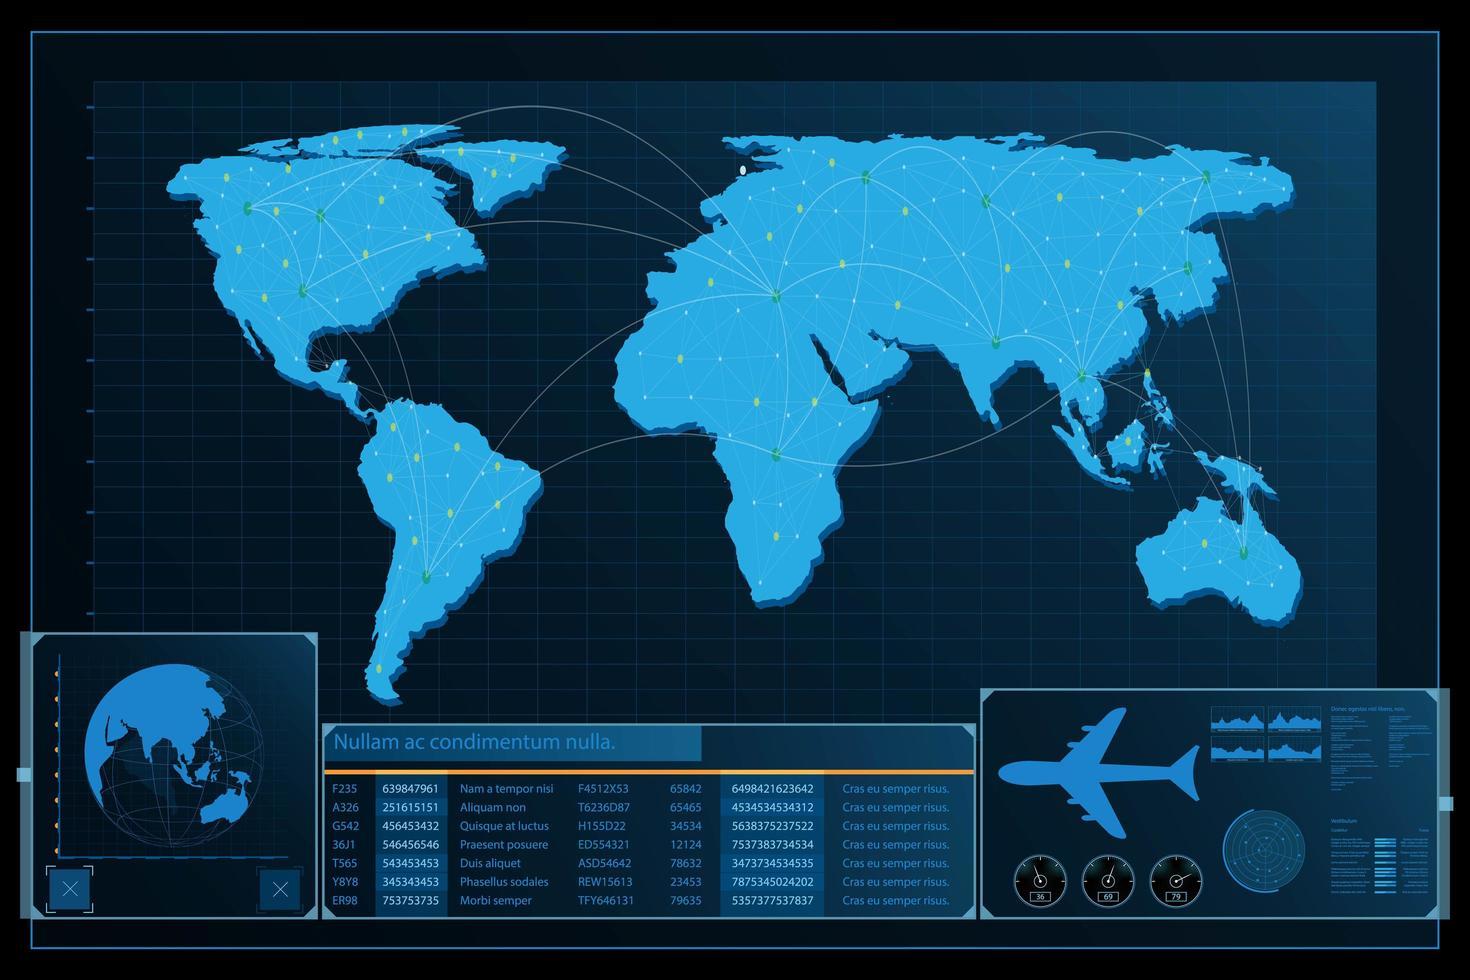 futuristische abstracte wereldkaart achtergrond vector